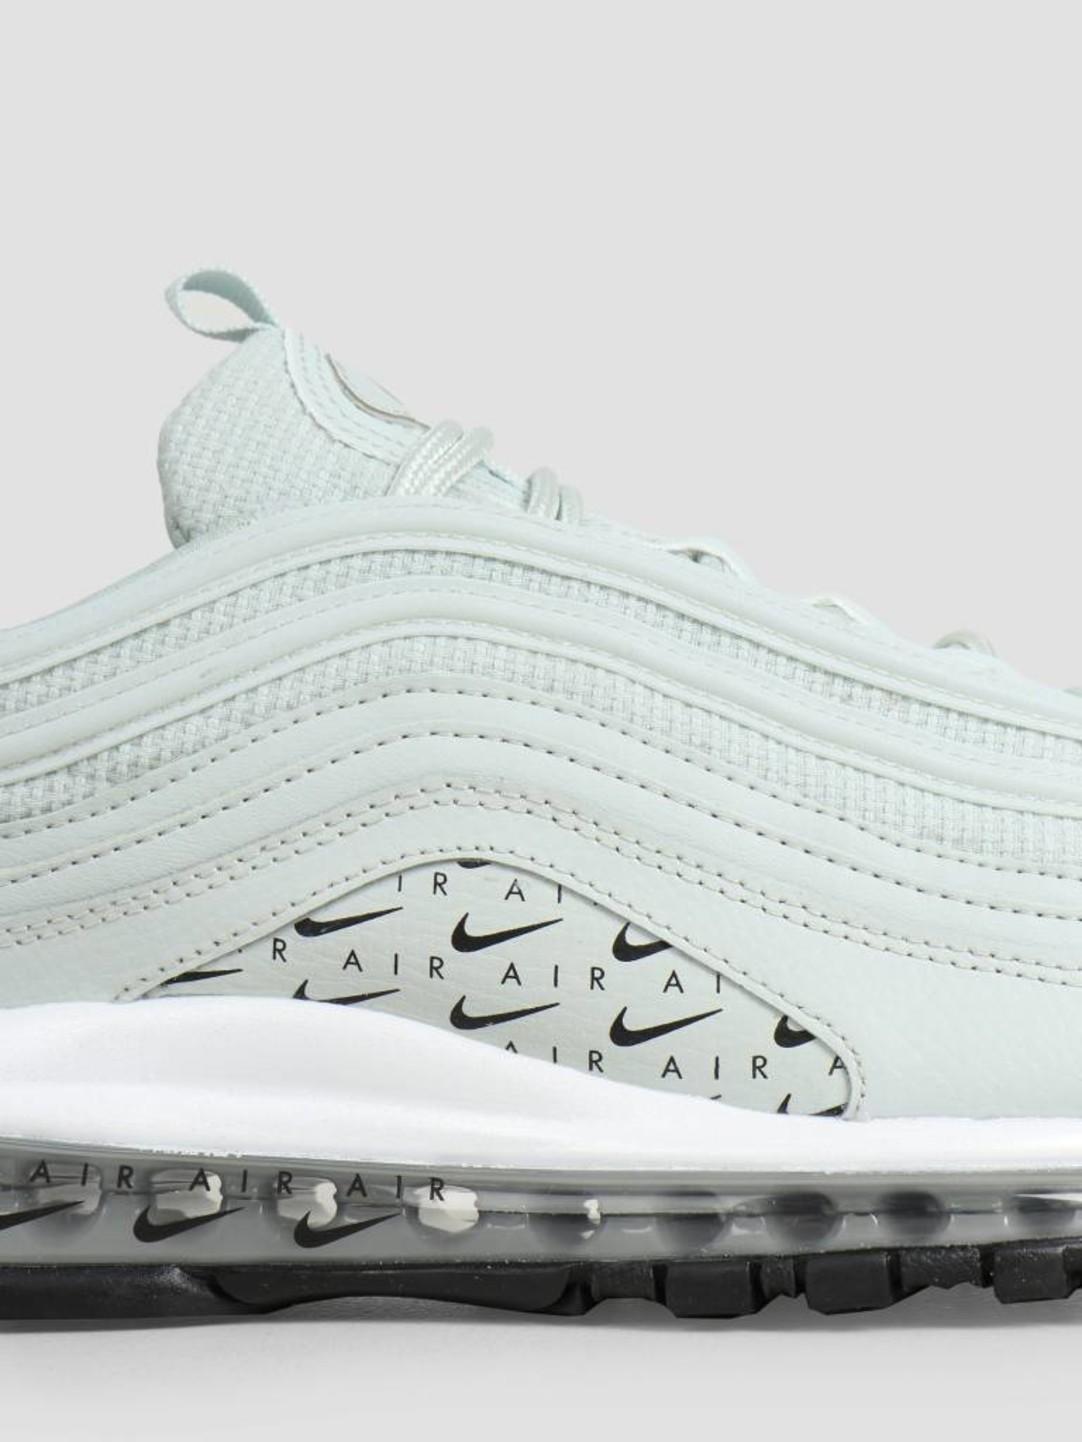 premium selection 6ab01 b6b19 Nike Air Max 97 Lux Light Silver Light Silver Black White Ar7621-002